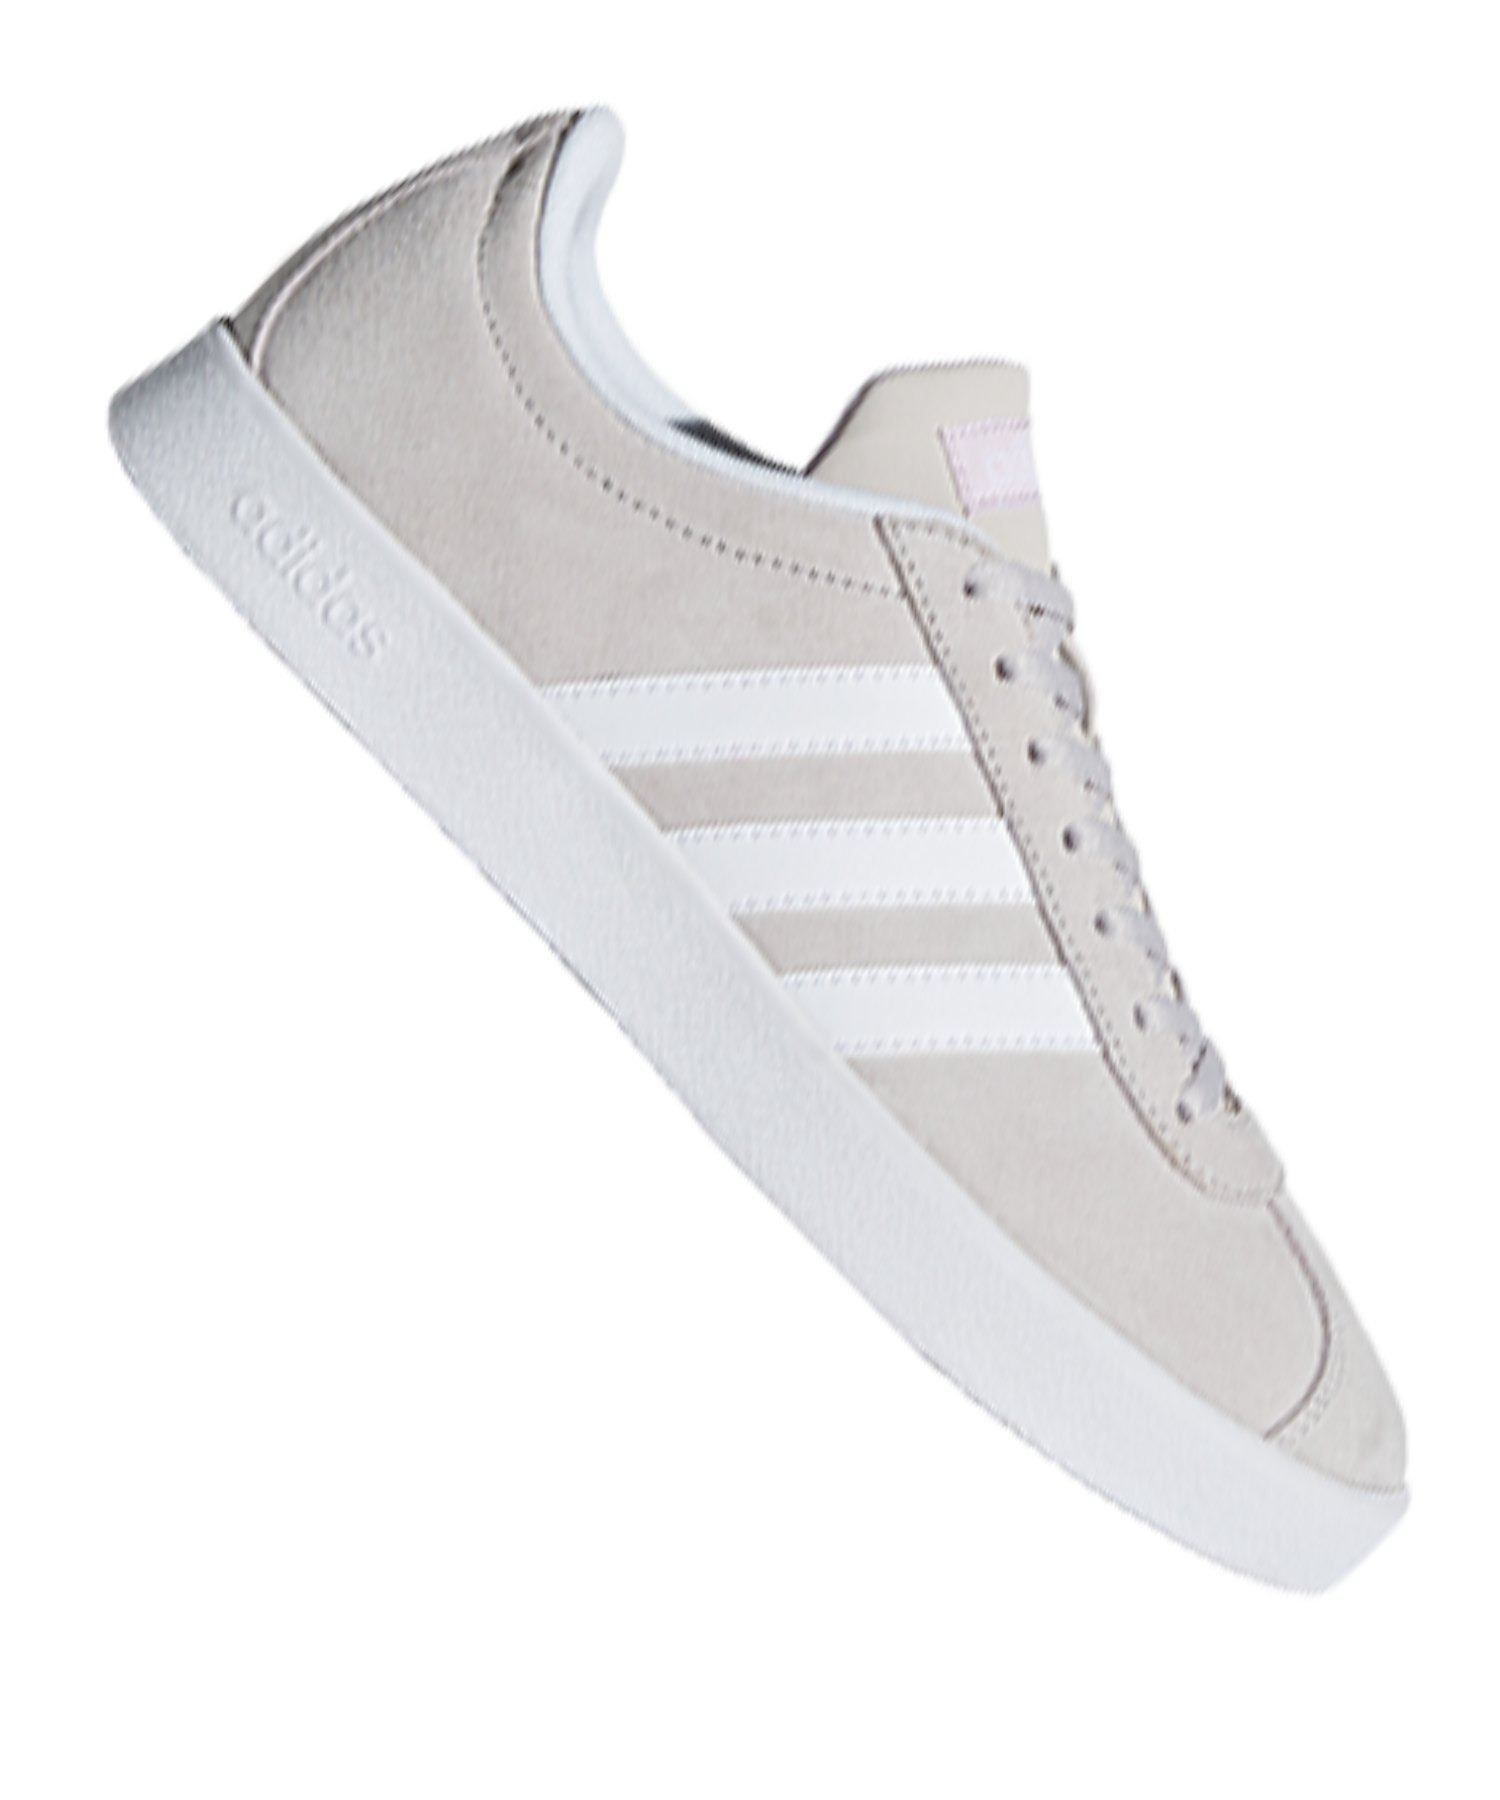 vl court adidas 0 2 schuh 19 QrdxhCtsB